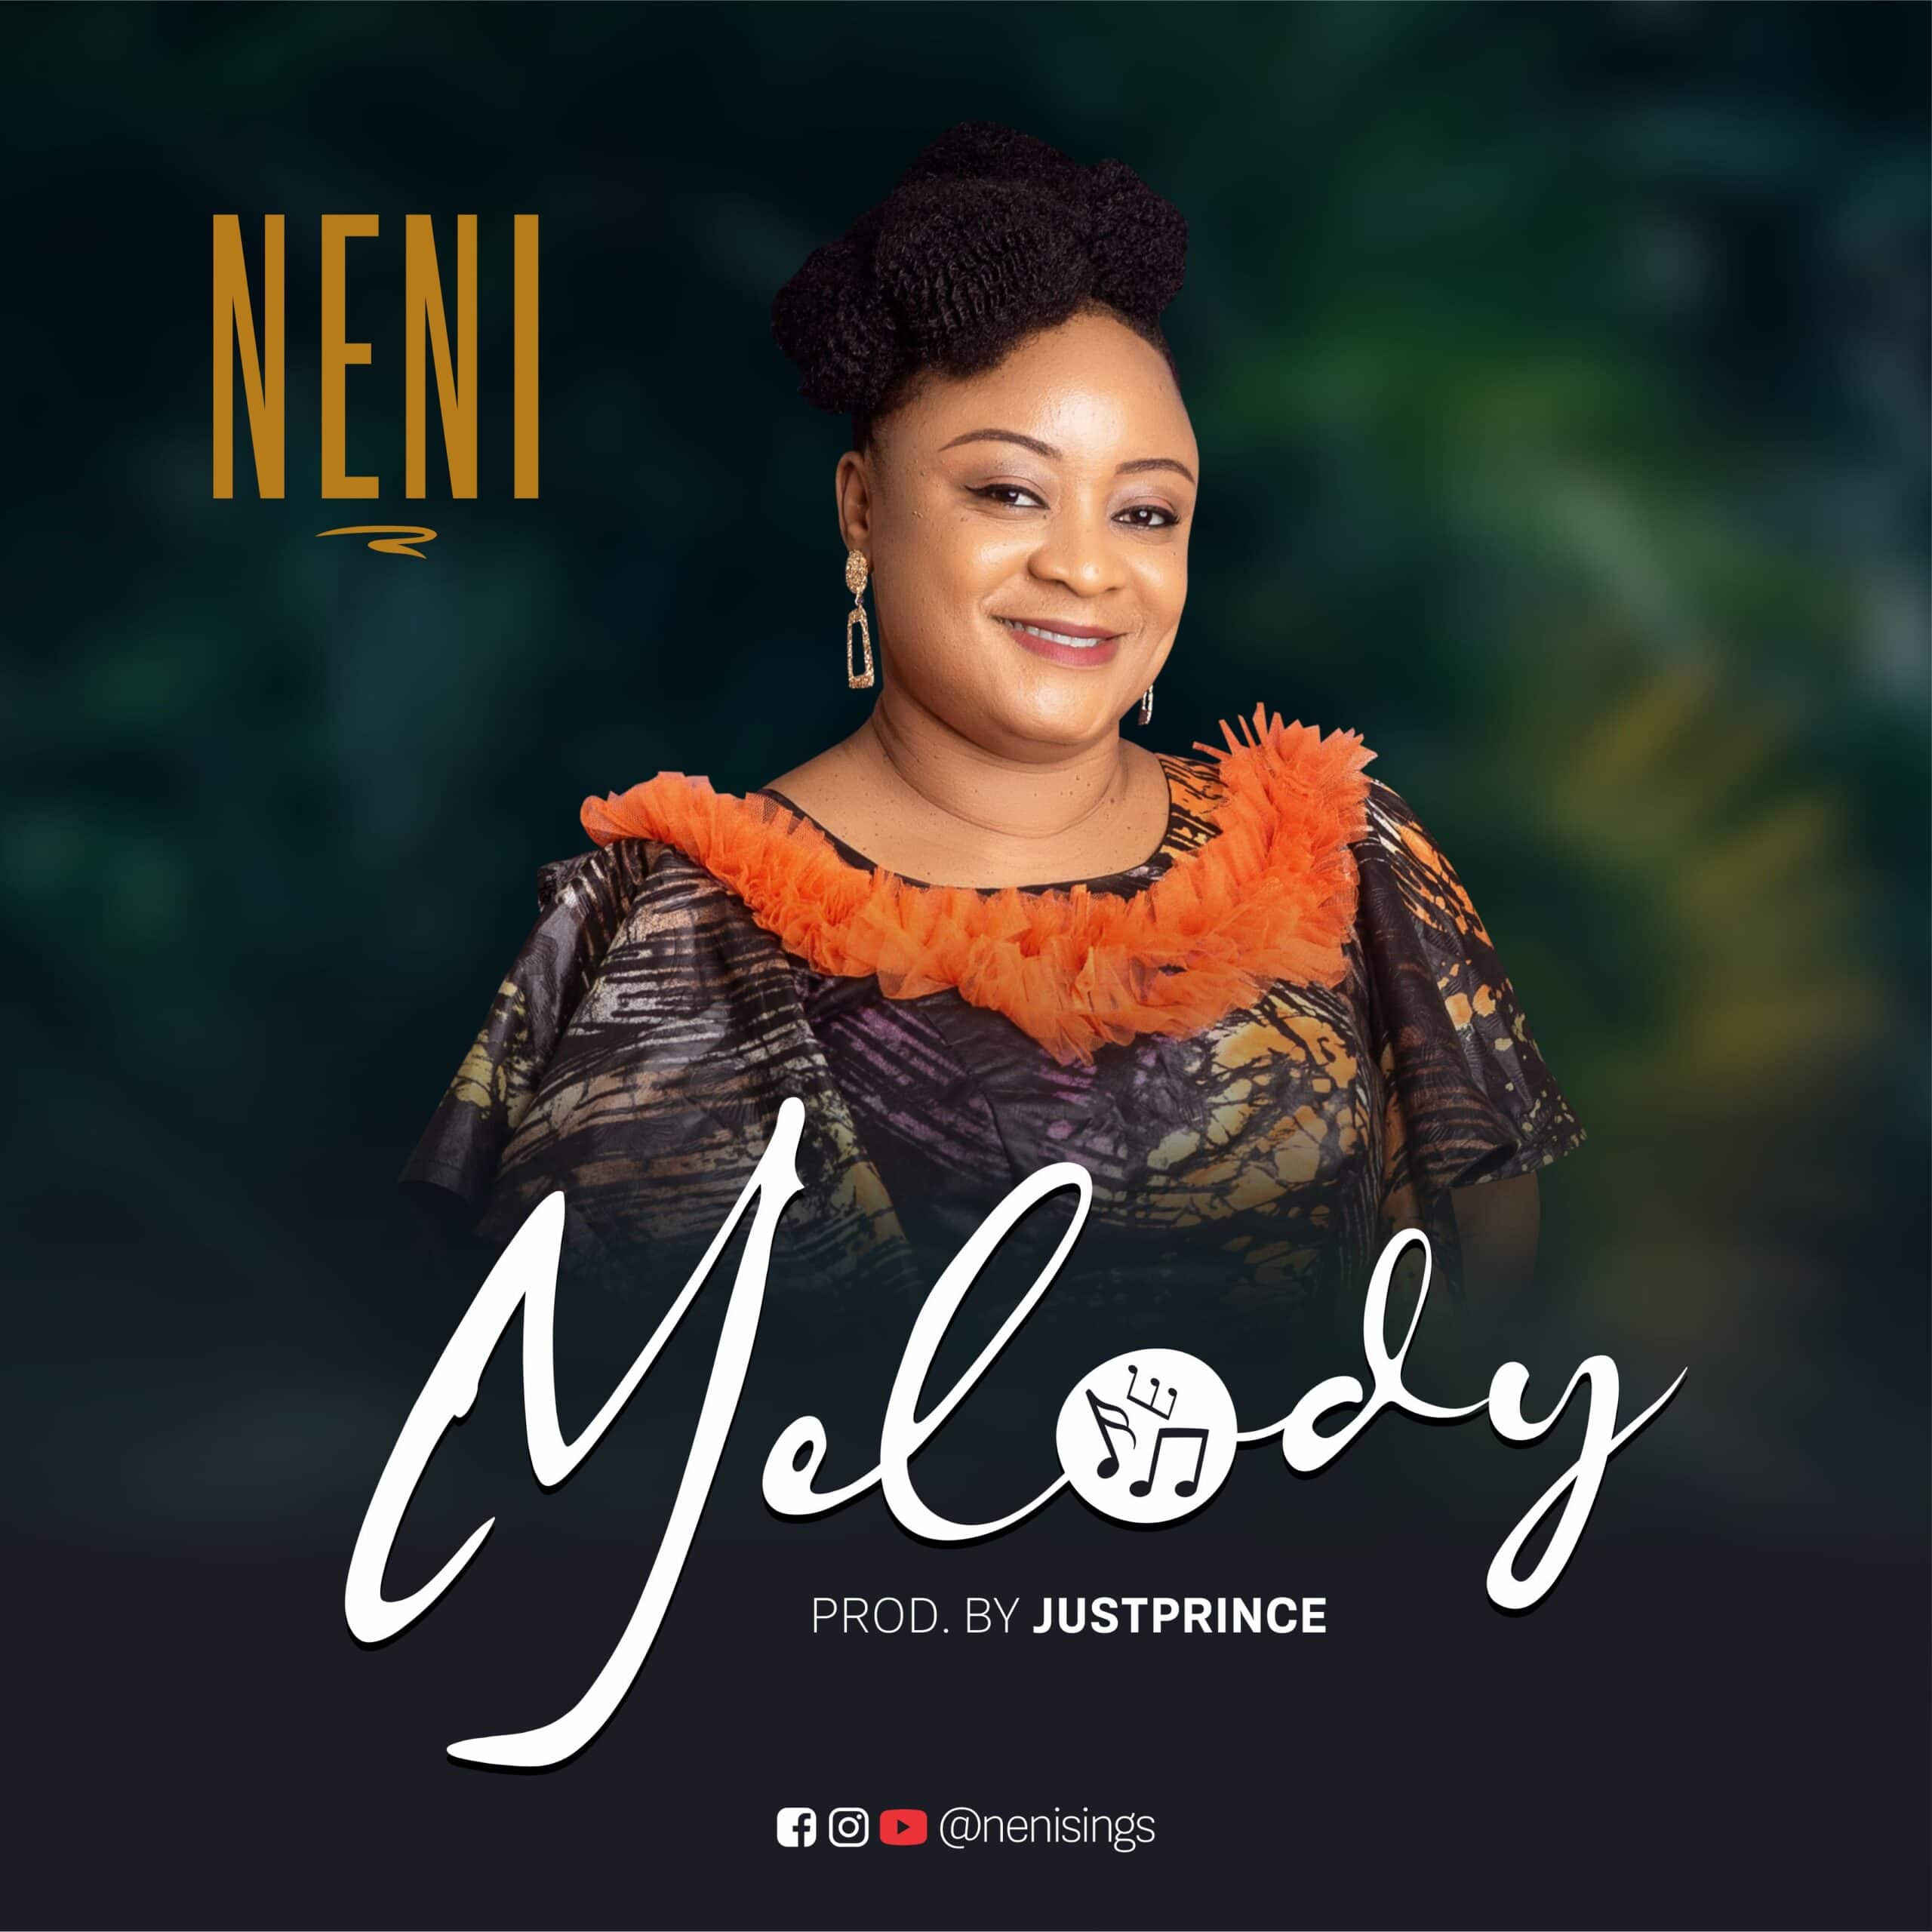 Neni - Melody